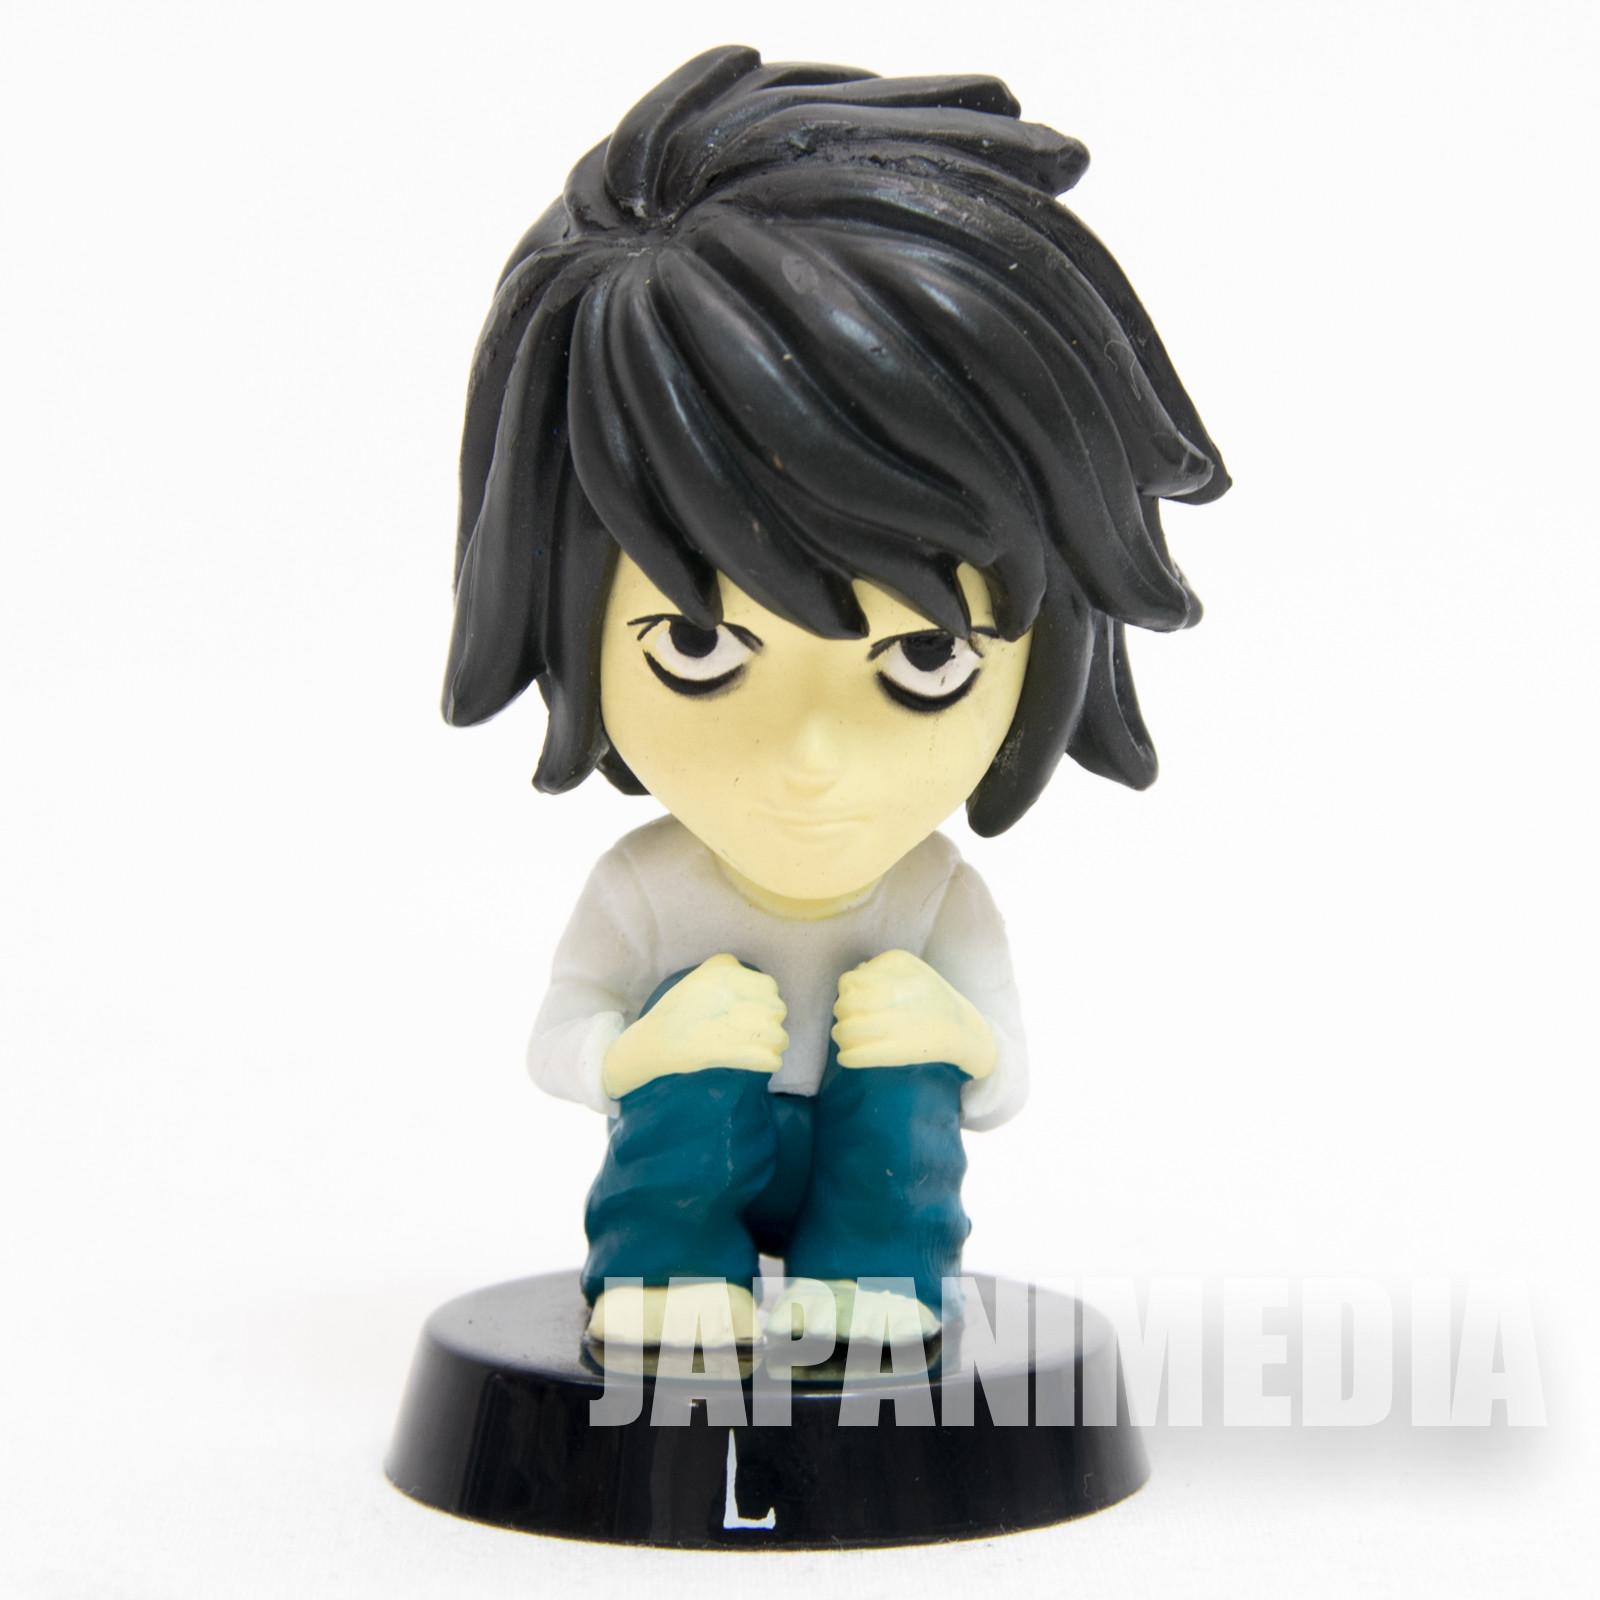 Death Note L Ryuzaki Bobble Bobbin Head Figure JAPAN ANIME MANGA